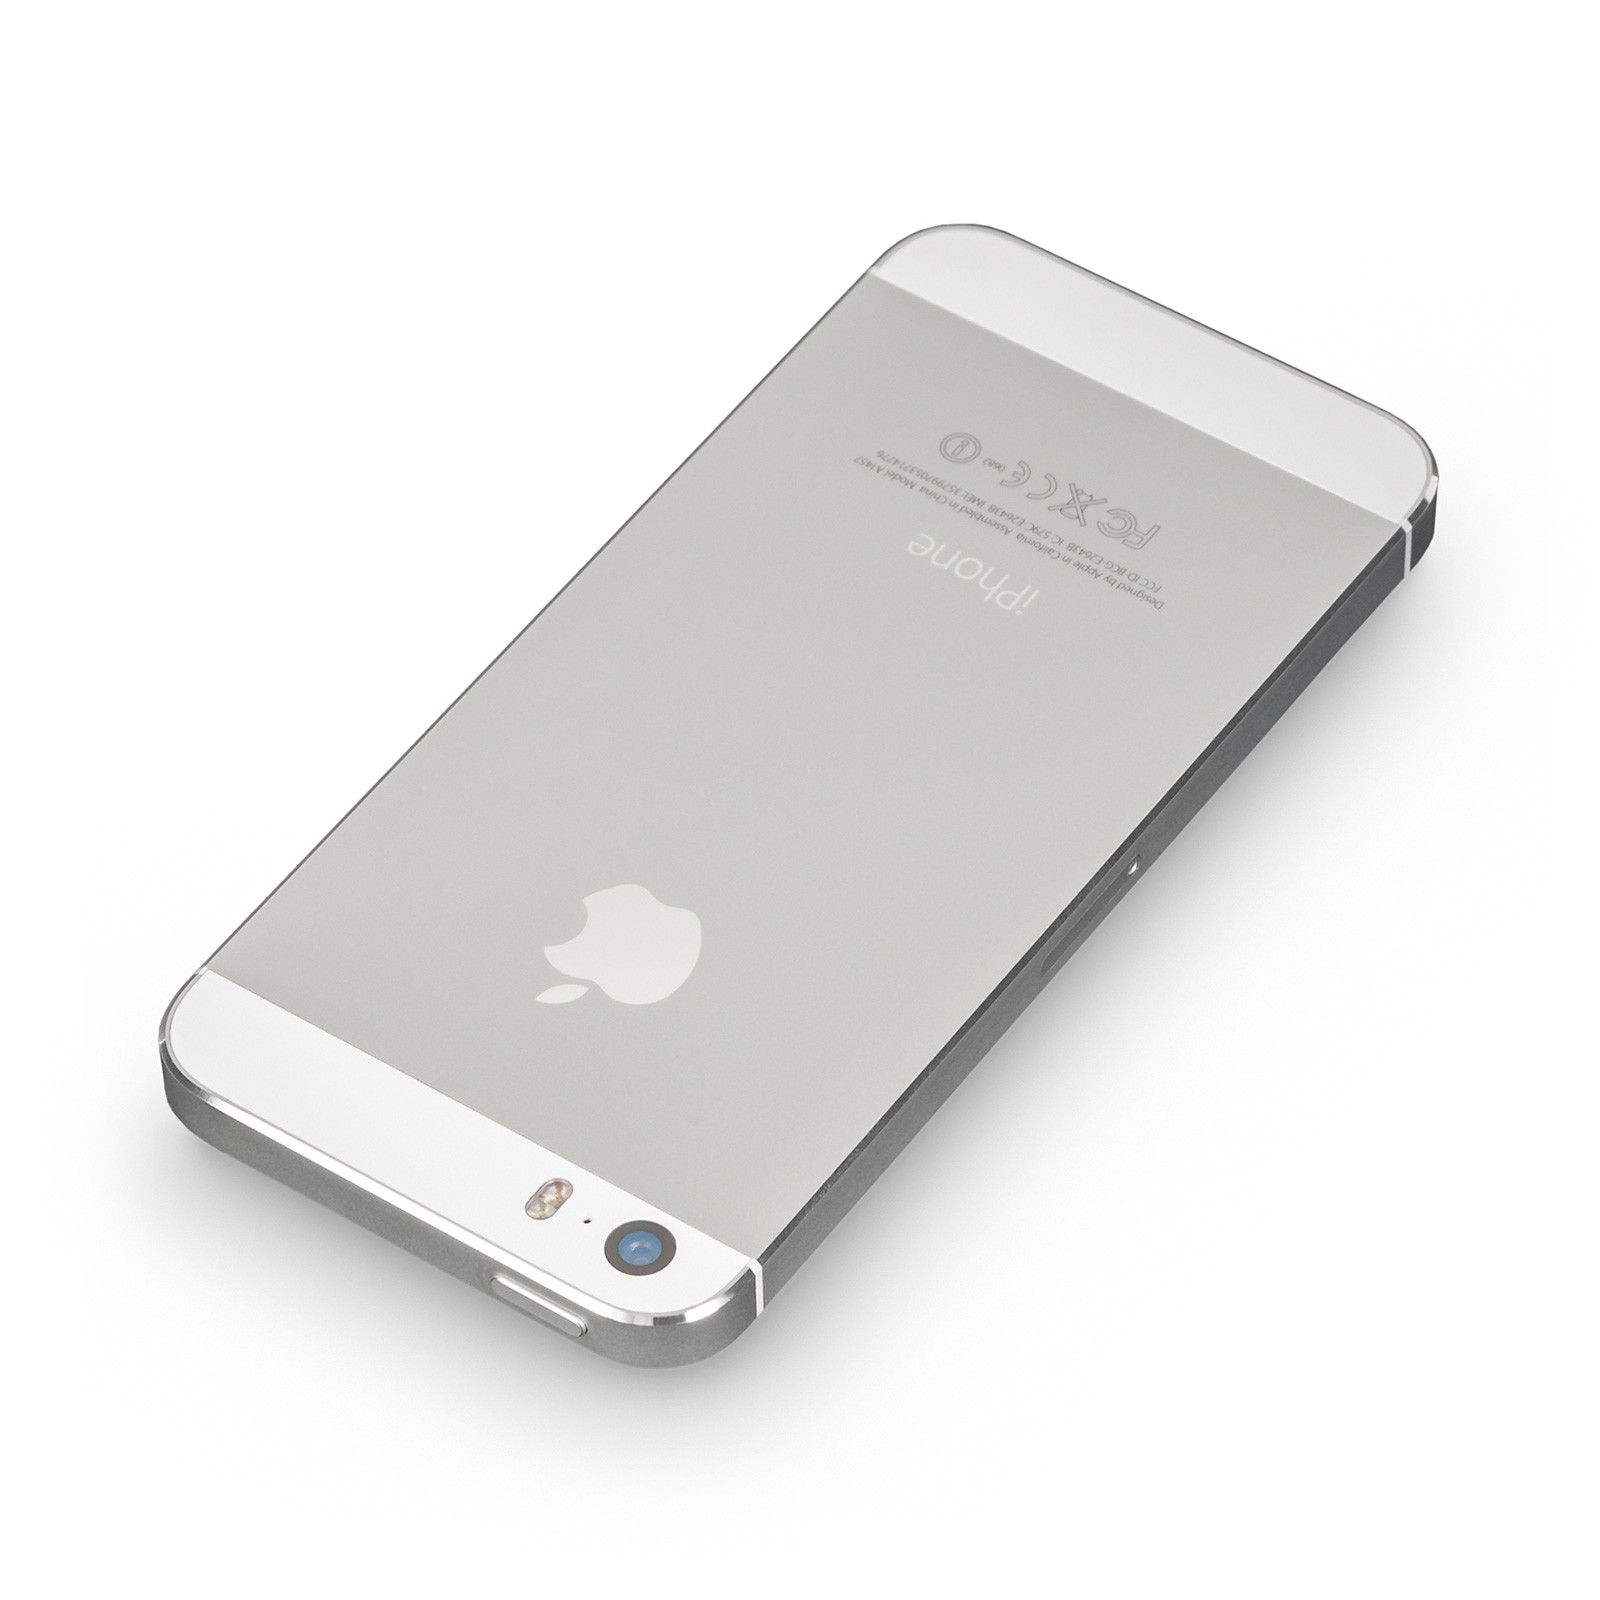 apple iphone 5s 16gb silber wie neu ohne simlock. Black Bedroom Furniture Sets. Home Design Ideas